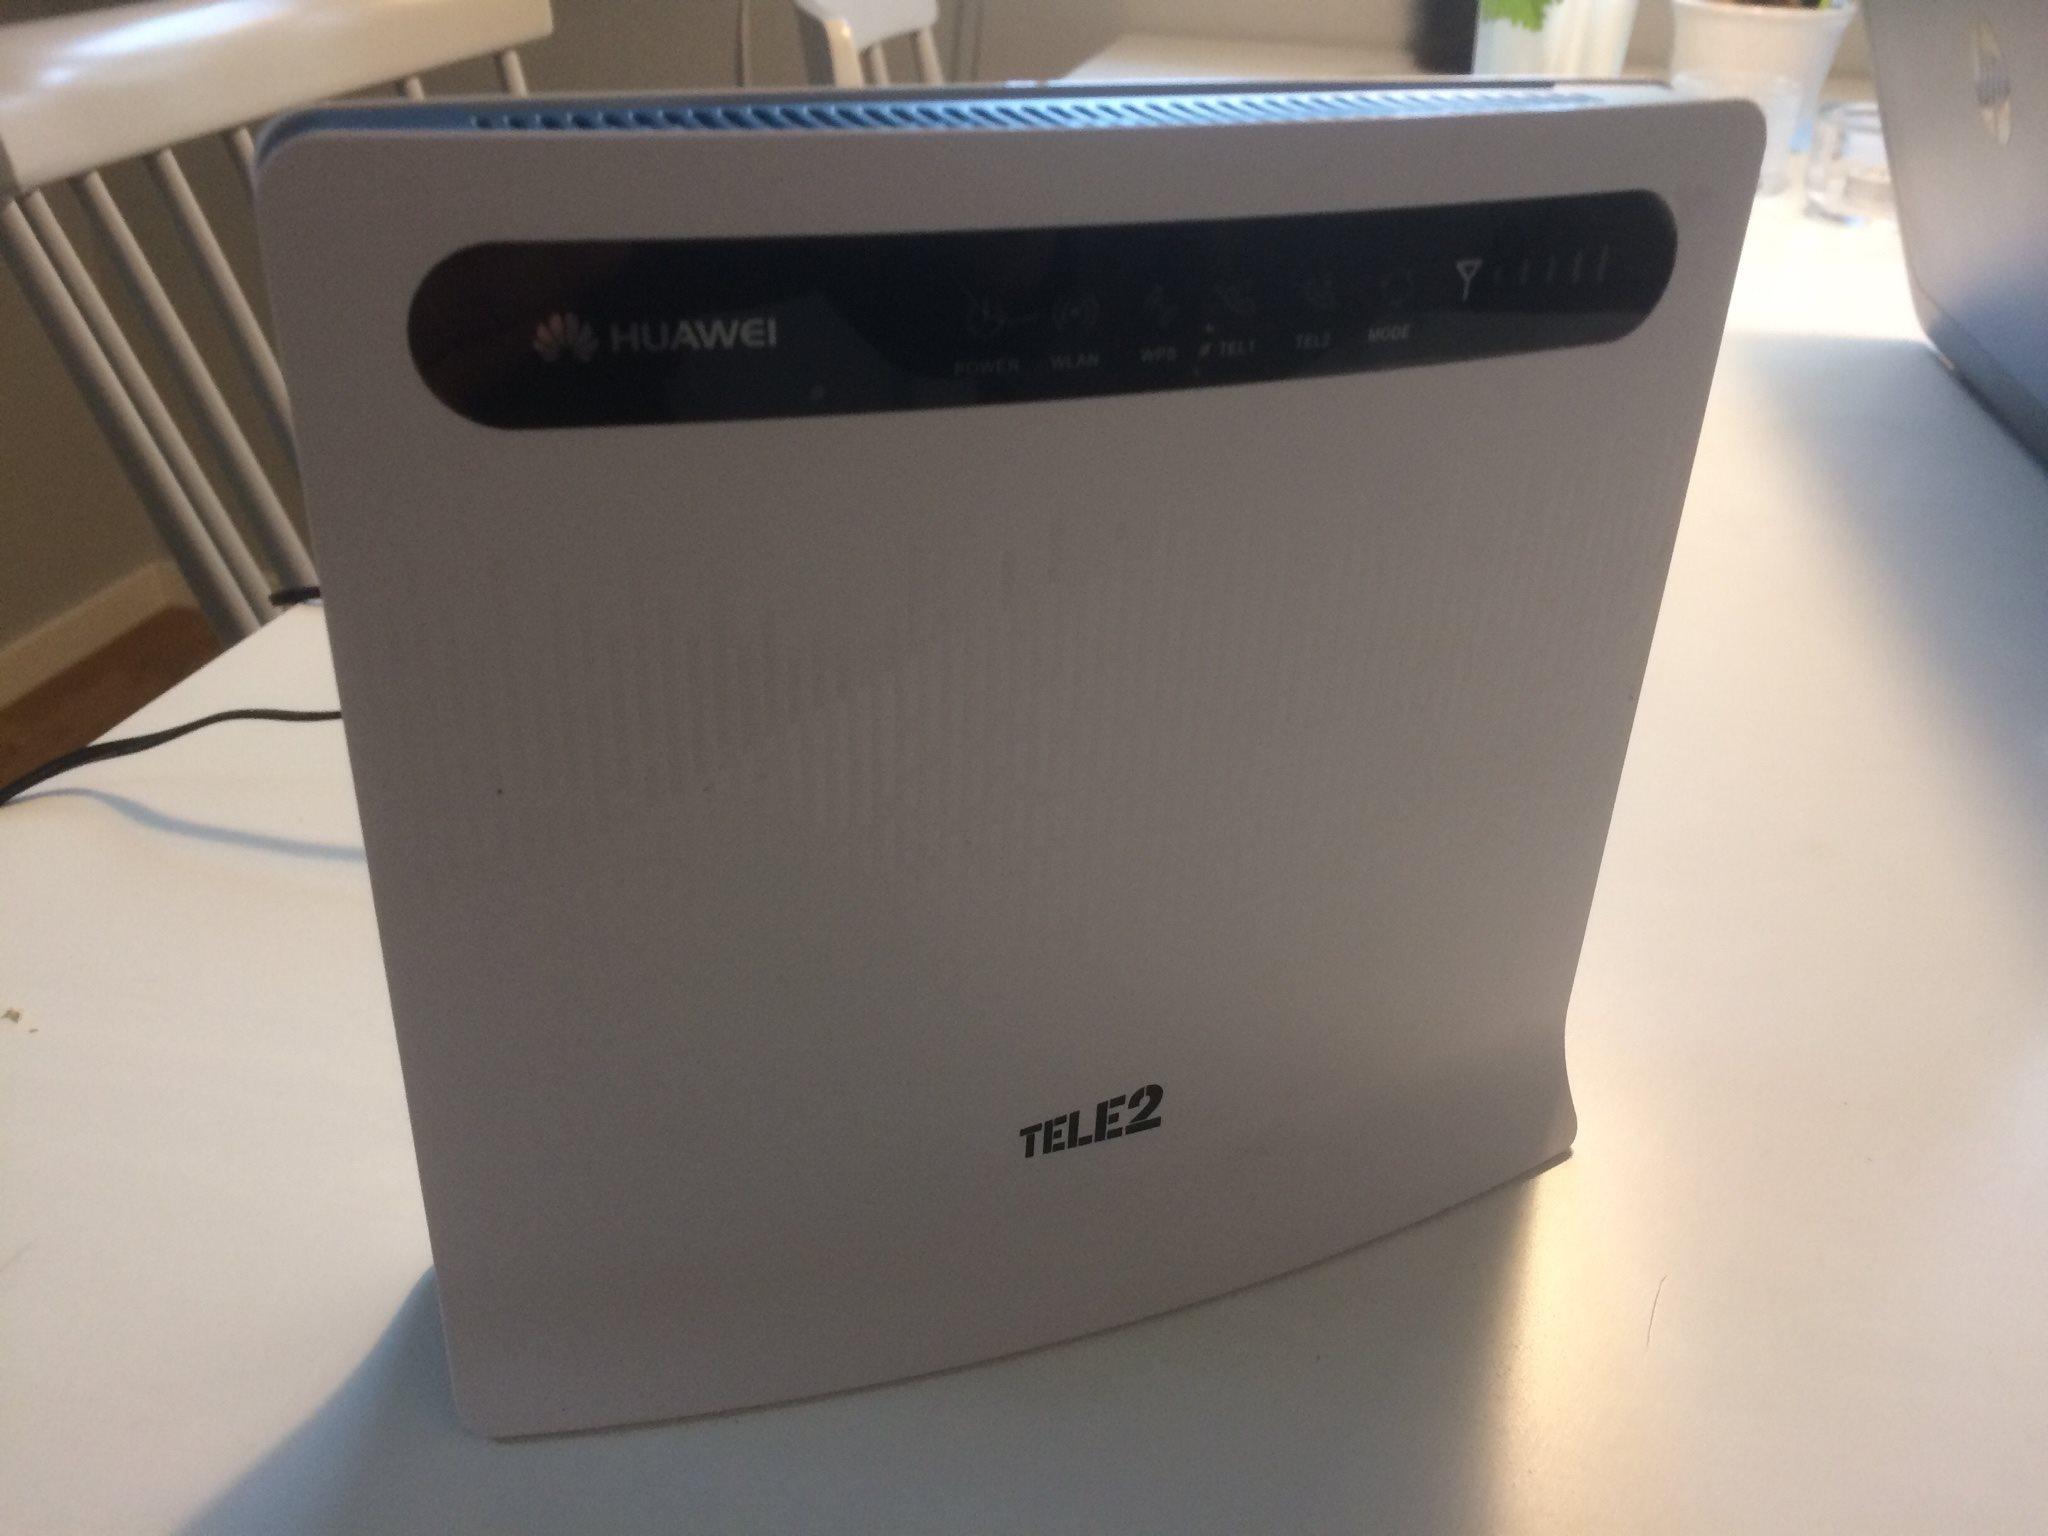 mobilt bredband medium tele2